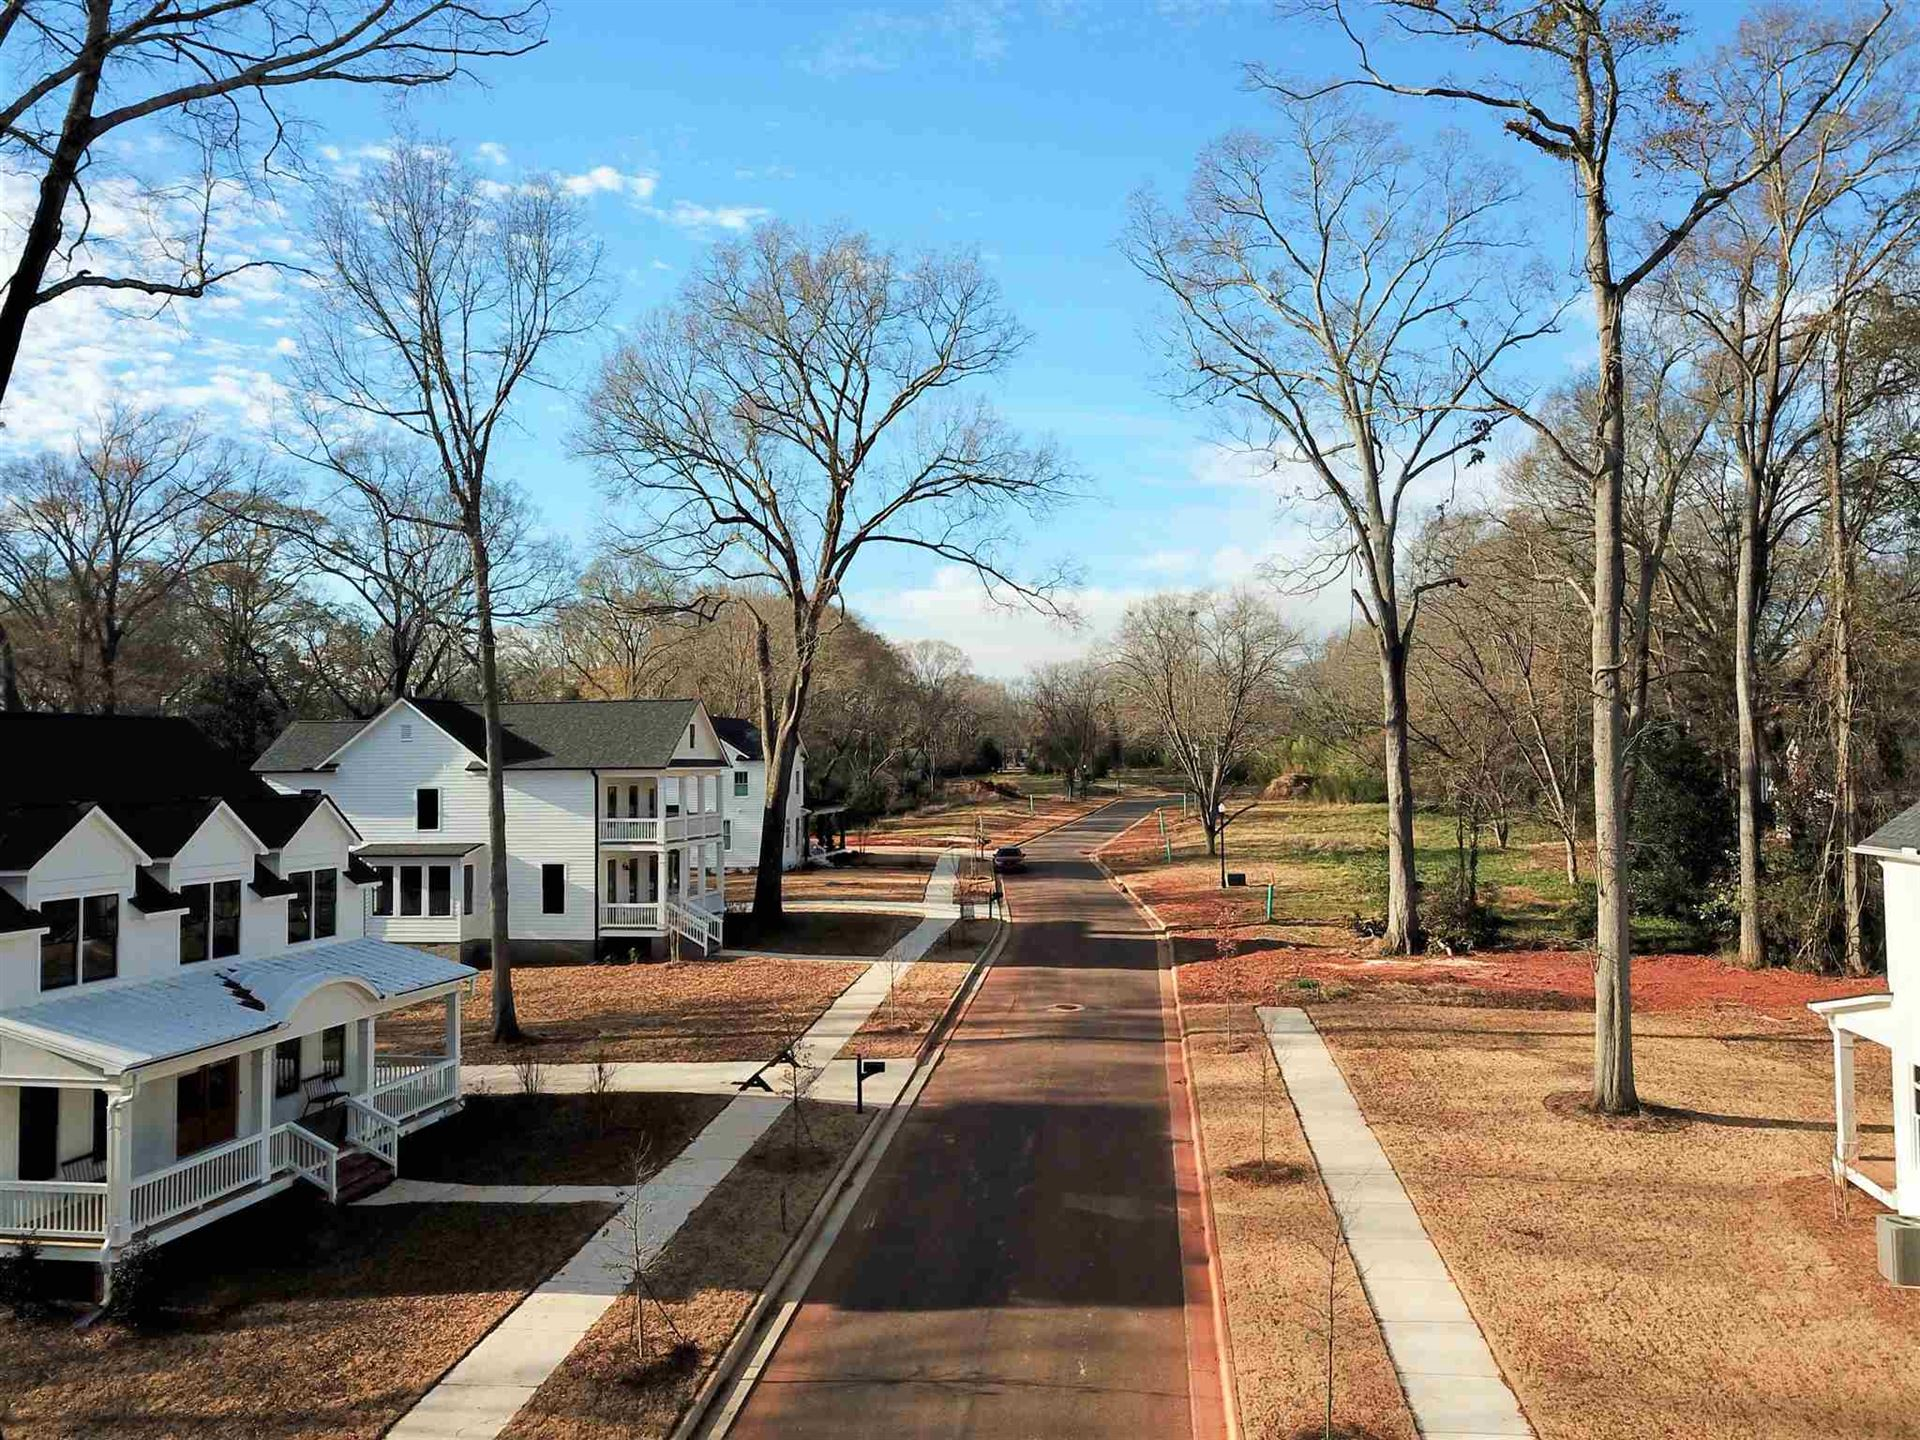 Photo of 699 Foster Park Ln, Madison, GA 30650 (MLS # 8905181)